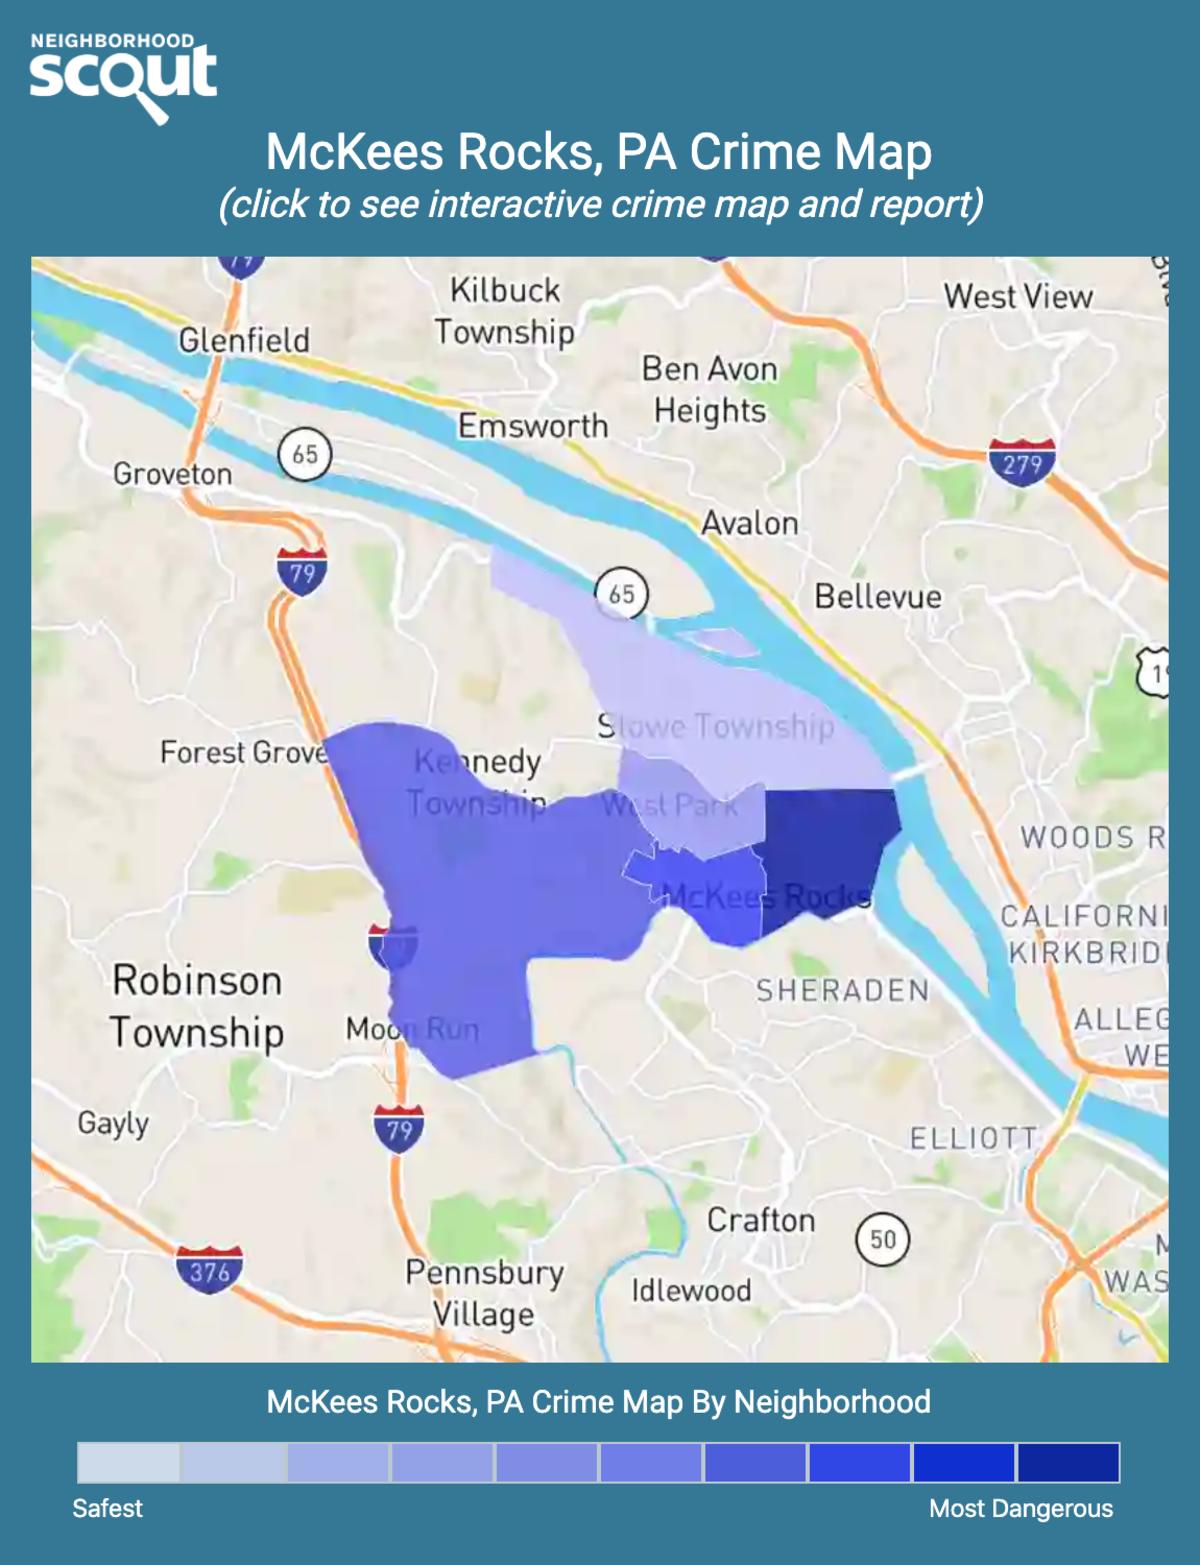 McKees Rocks, Pennsylvania crime map